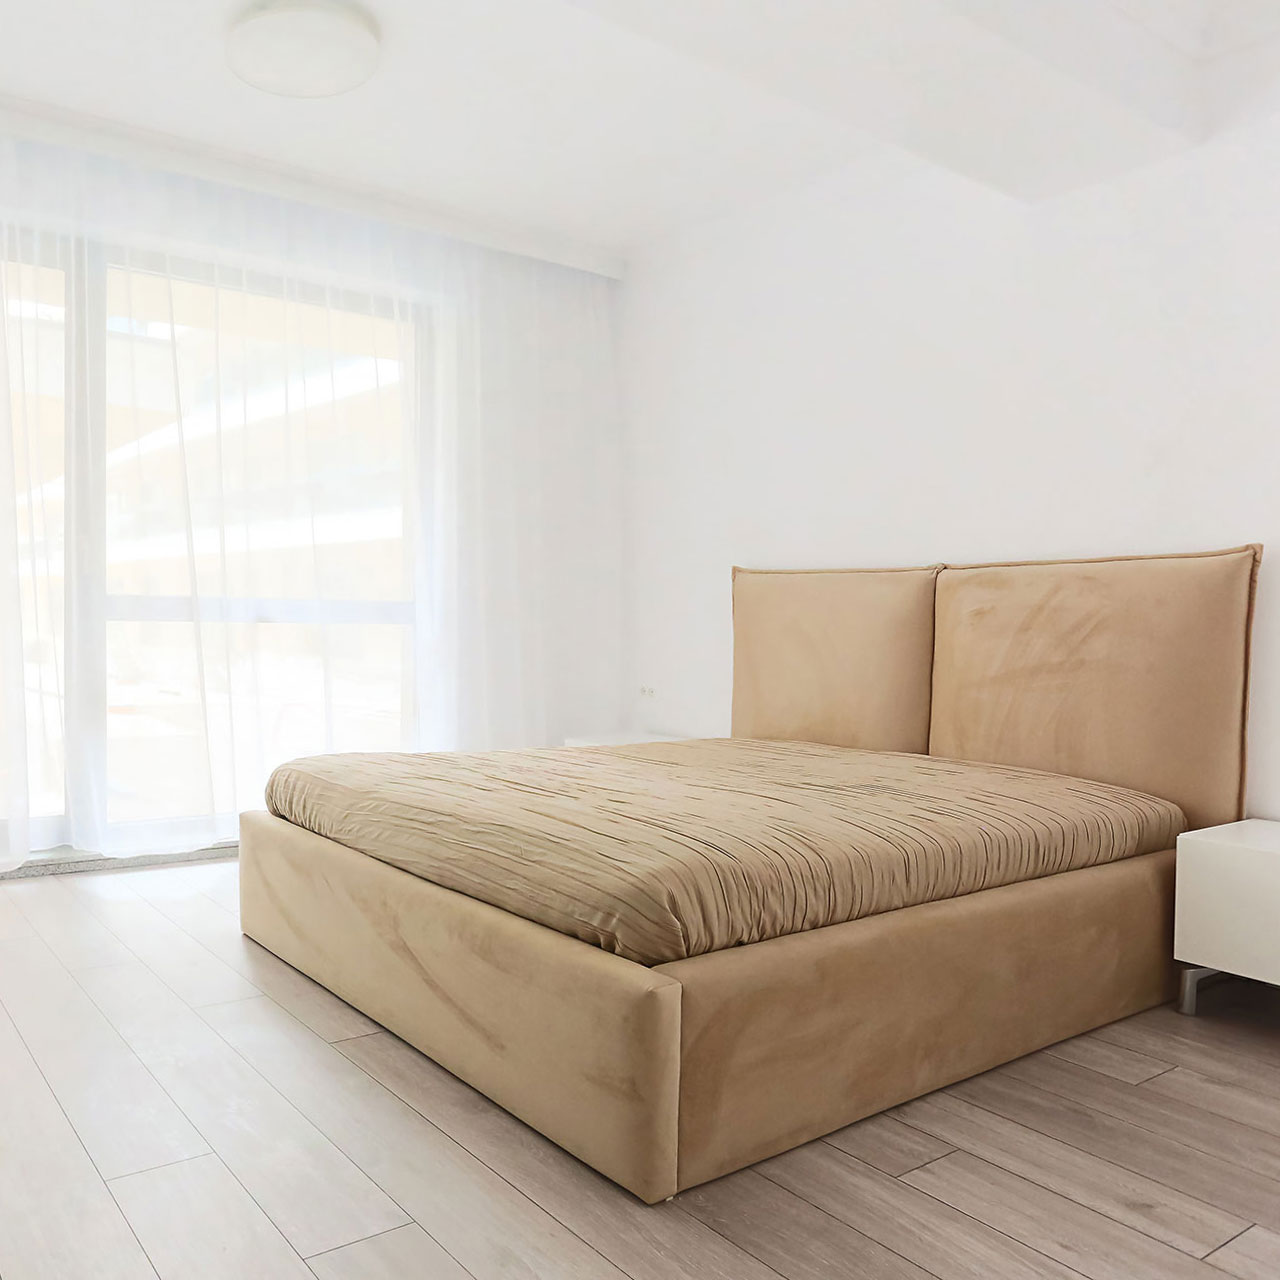 Apartamente de vanzare Bucuresti - Catedral Residence - Marriott, Piata Unirii, 13 Septembrie, Izvor - G4 - 5